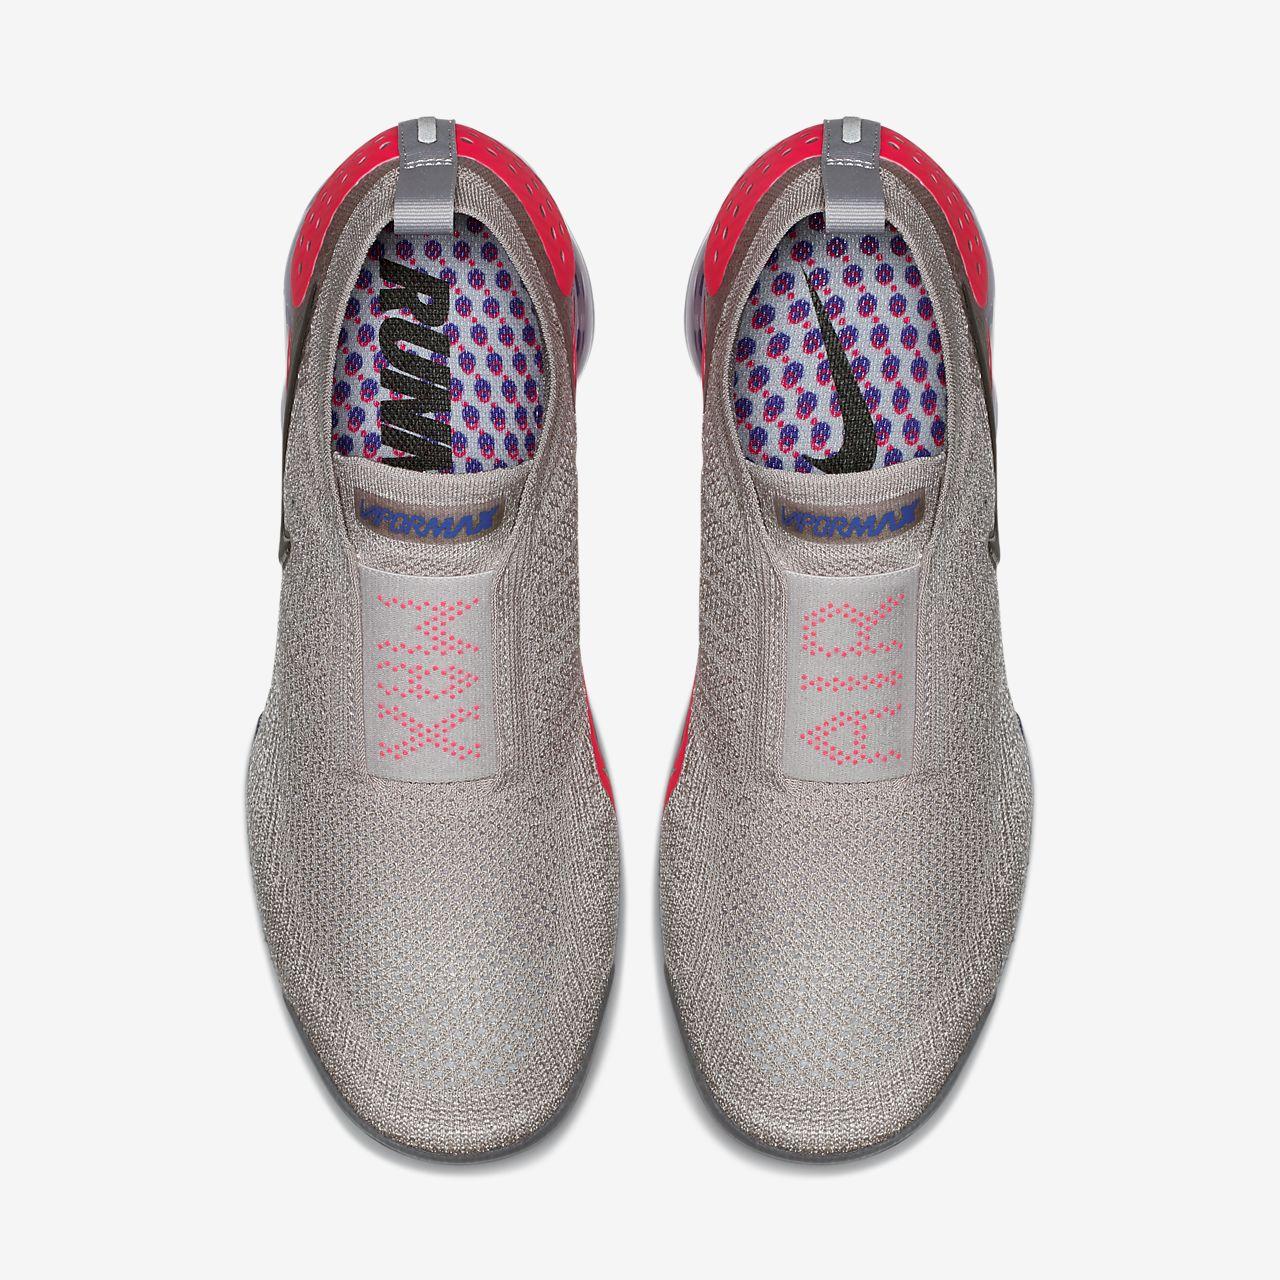 size 40 01078 ea49b ... Nike Air VaporMax Flyknit Moc 2 Shoe